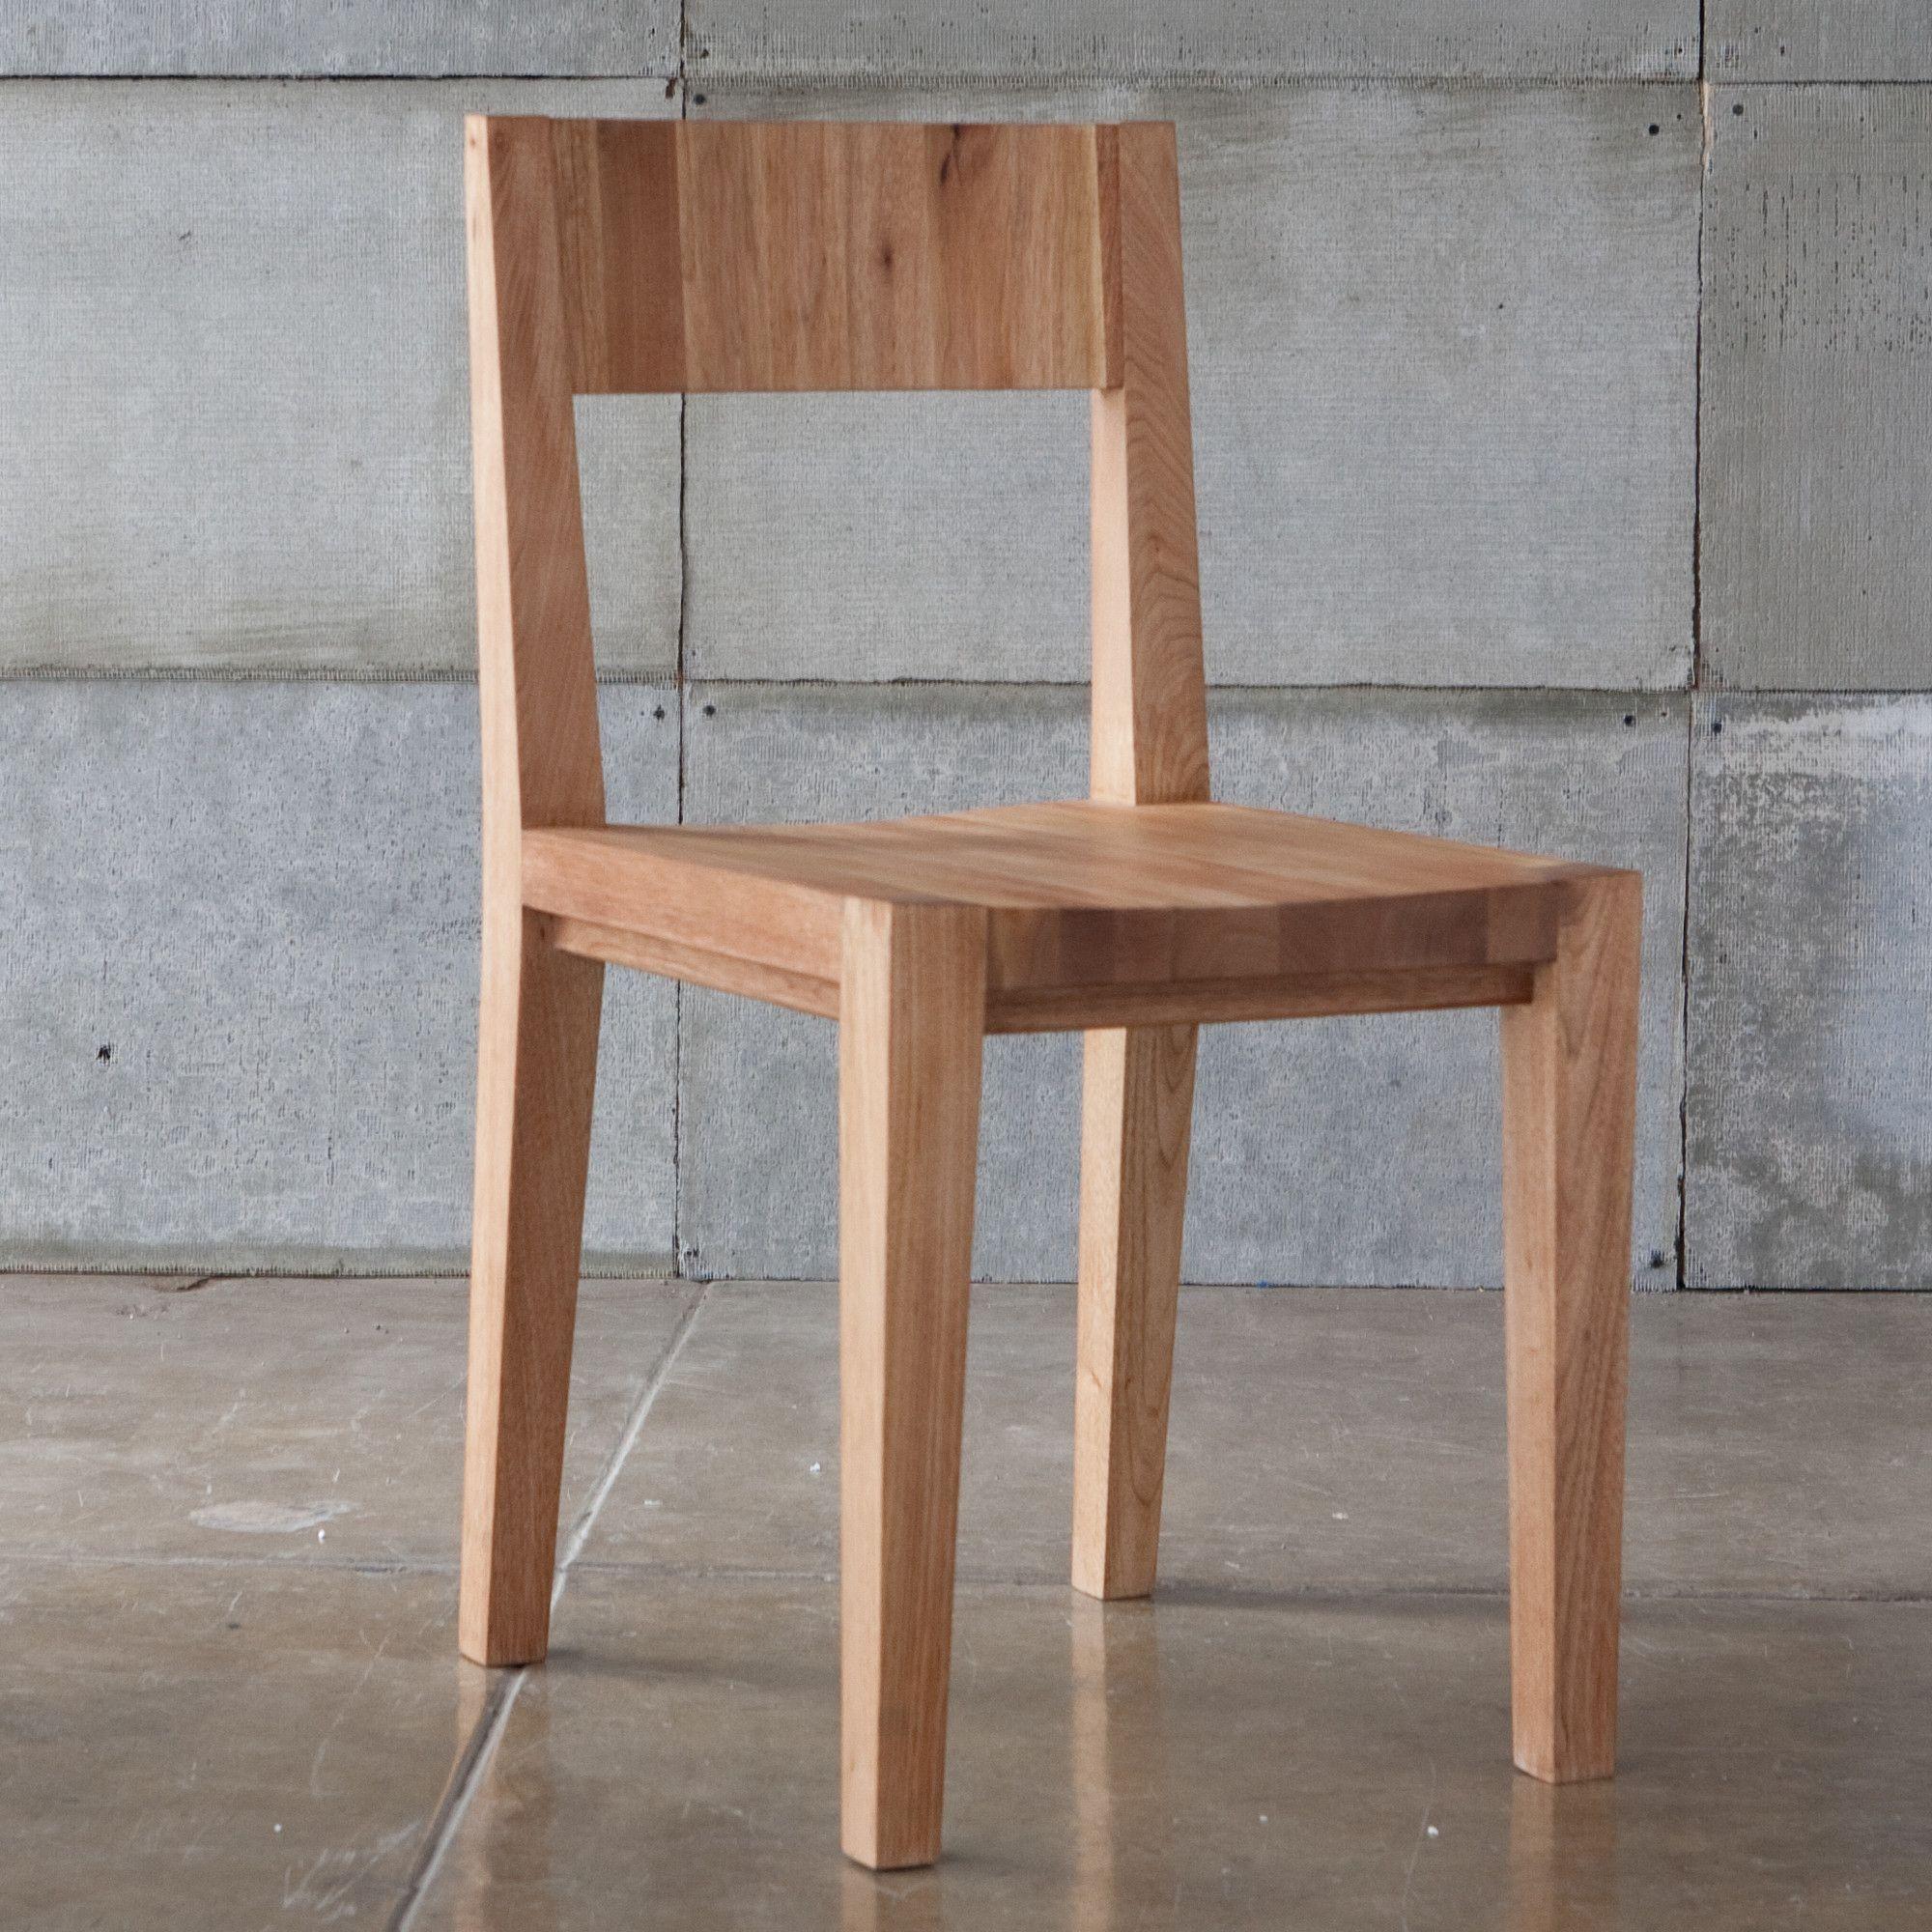 Mash Studios Side Chair - $290